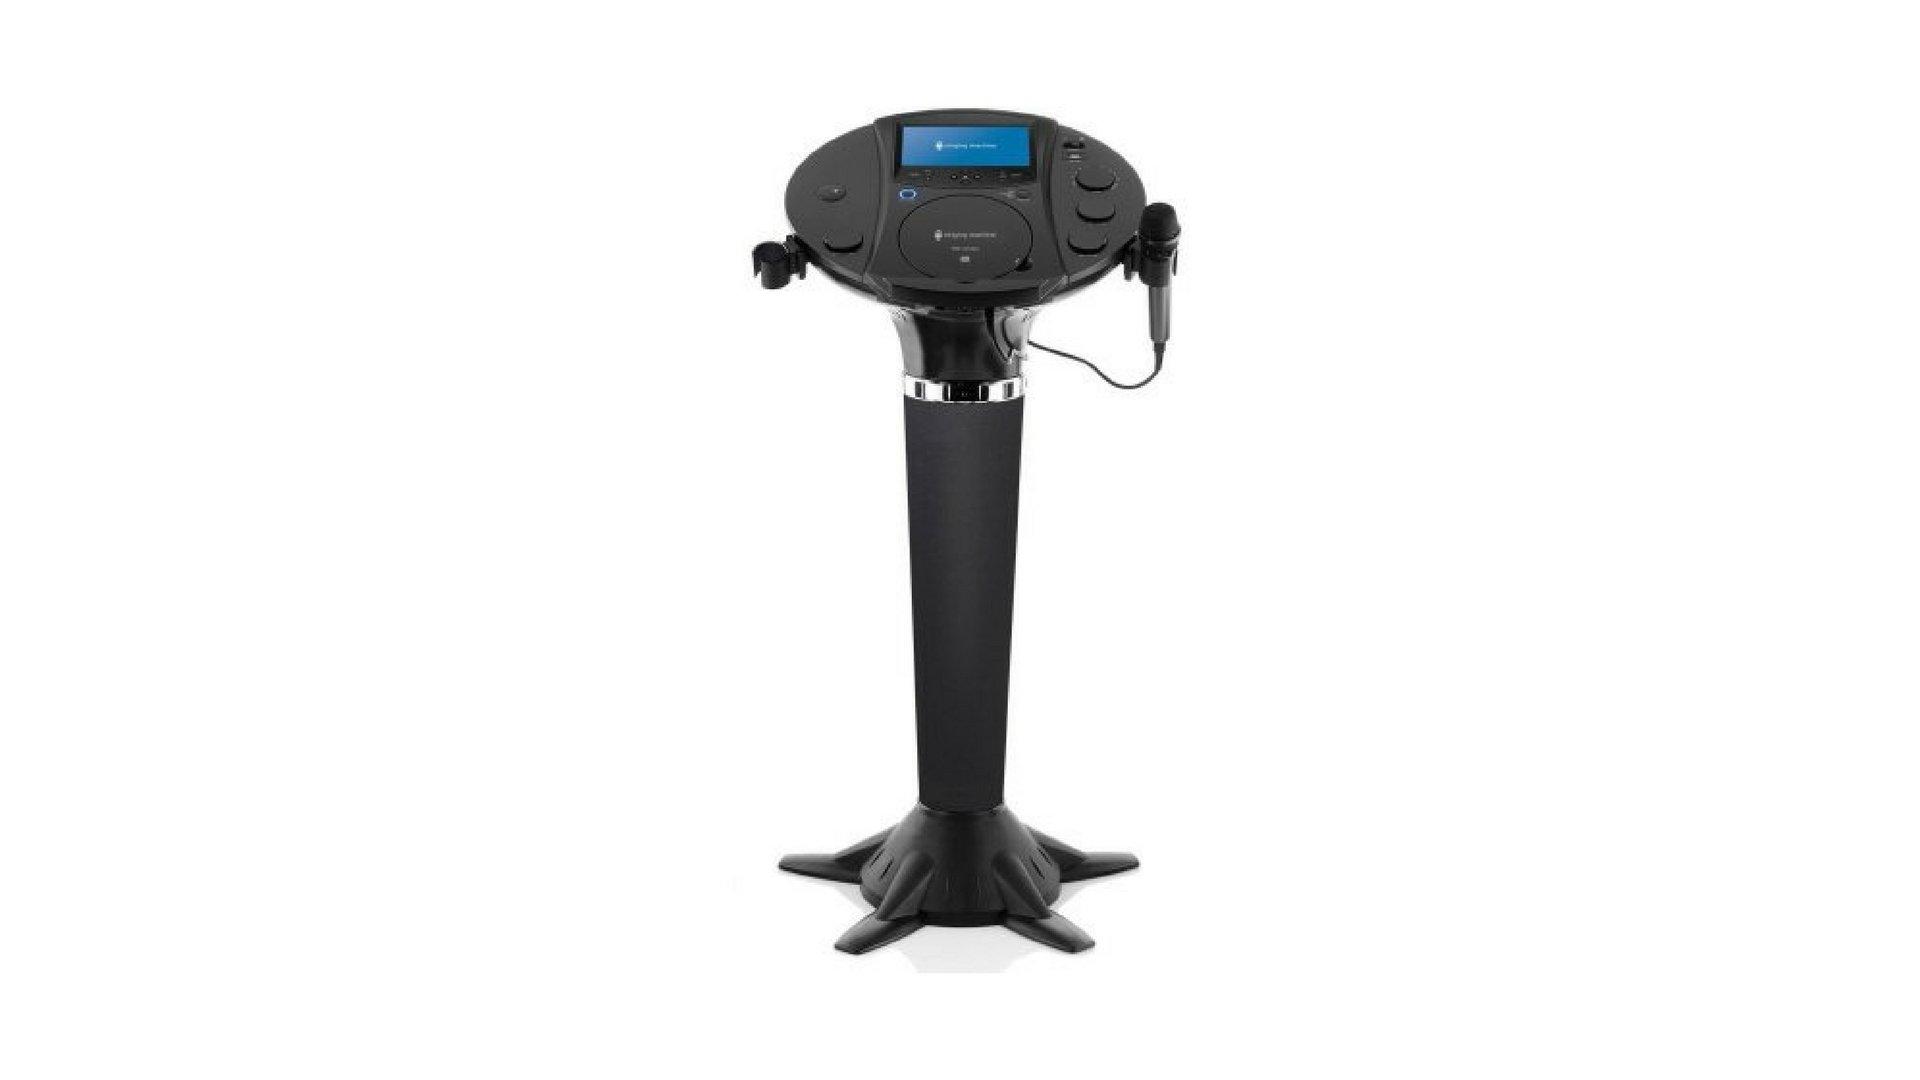 Singing Machine Bluetooth Pedestal Karaoke Streaming, CD+G, or MP3+G with built-in speakers